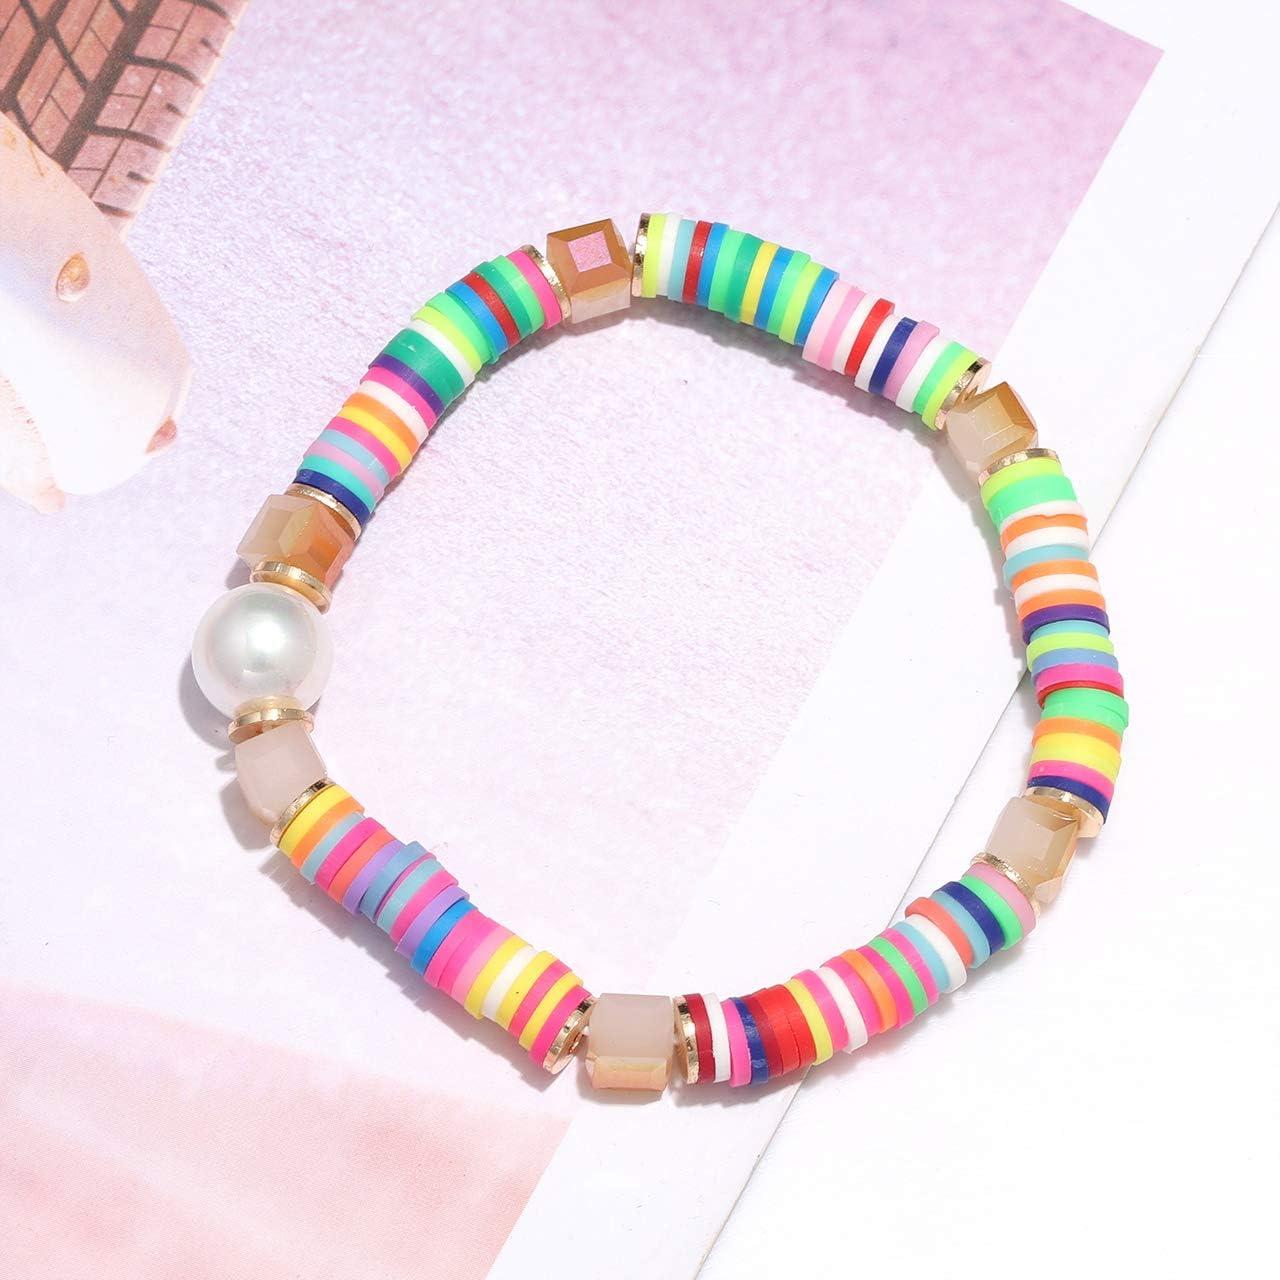 African Vinyl Stretch BraceletBaroque Pearl BraceletColorful Bracelet StackColorful Tassel BraceletVulcanite Disc BeadsPearl Bracelet